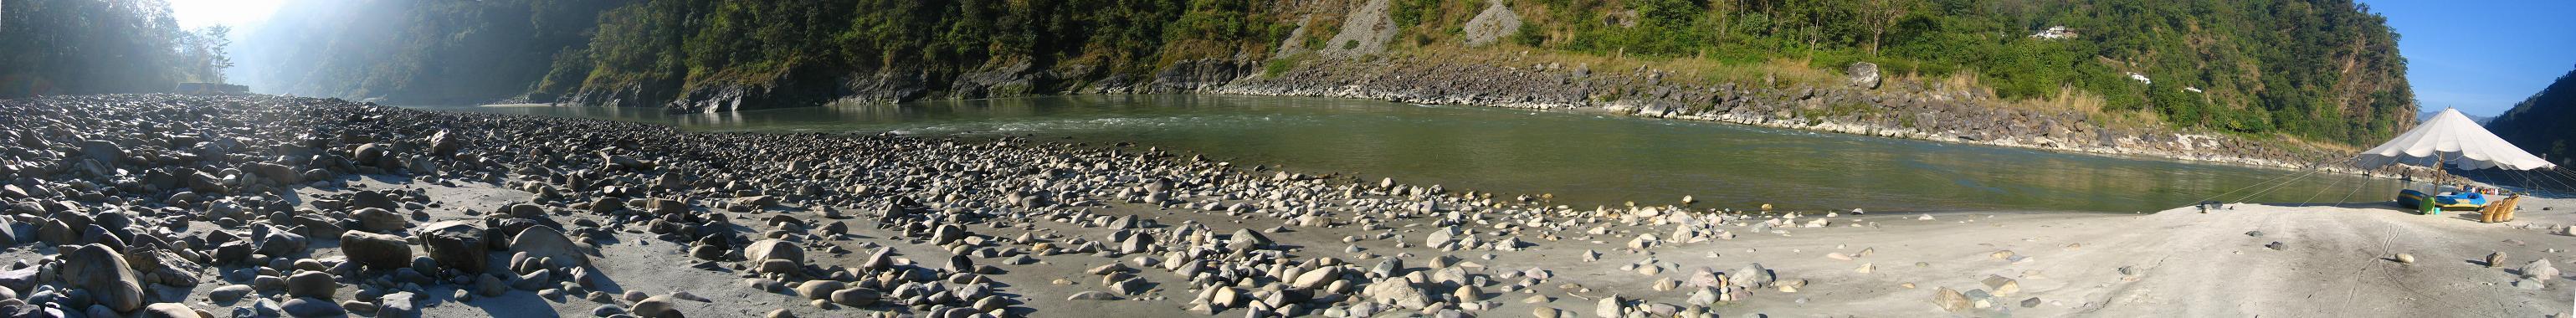 India_riverrafting2